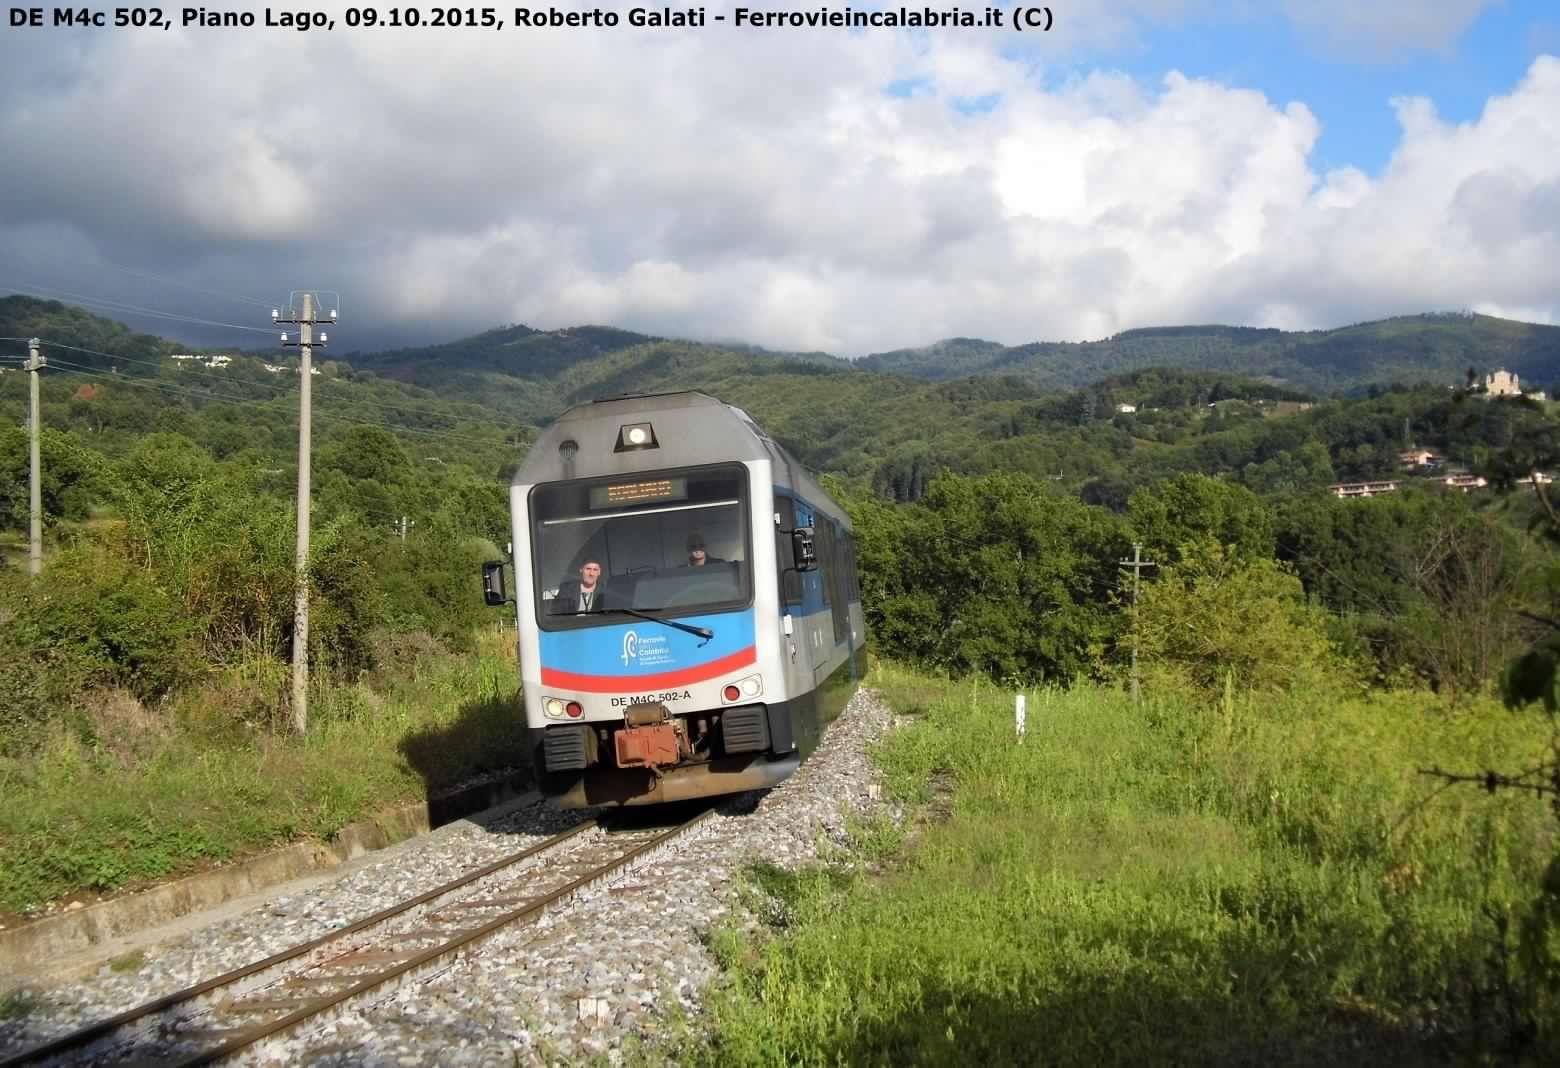 FC-DE M4c502-PianoLago-2015-09-10-RobertoGalati